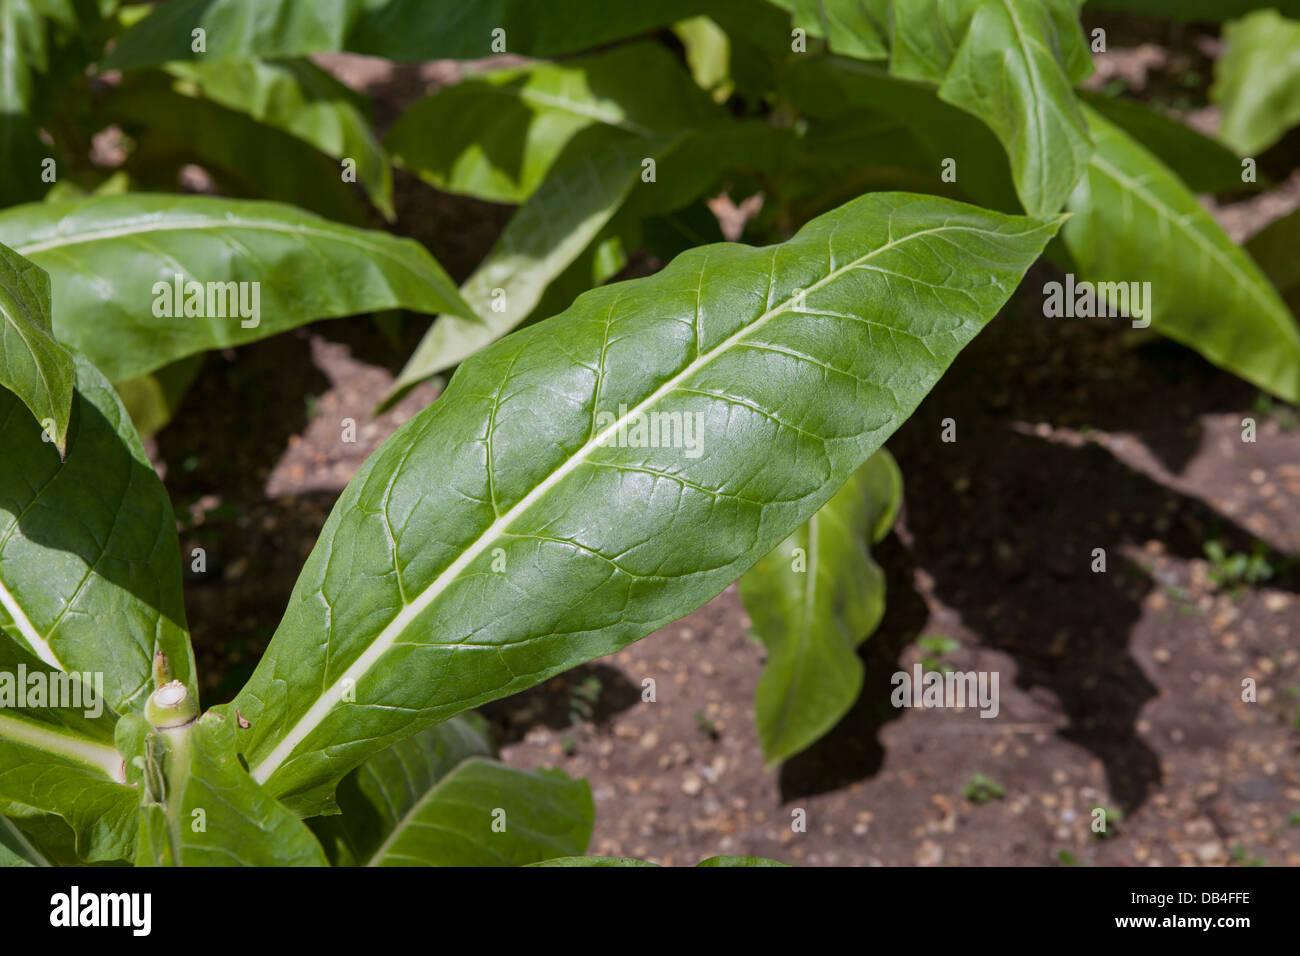 Tobacco plant (Nicotiana tabacum) leaves - Stock Image